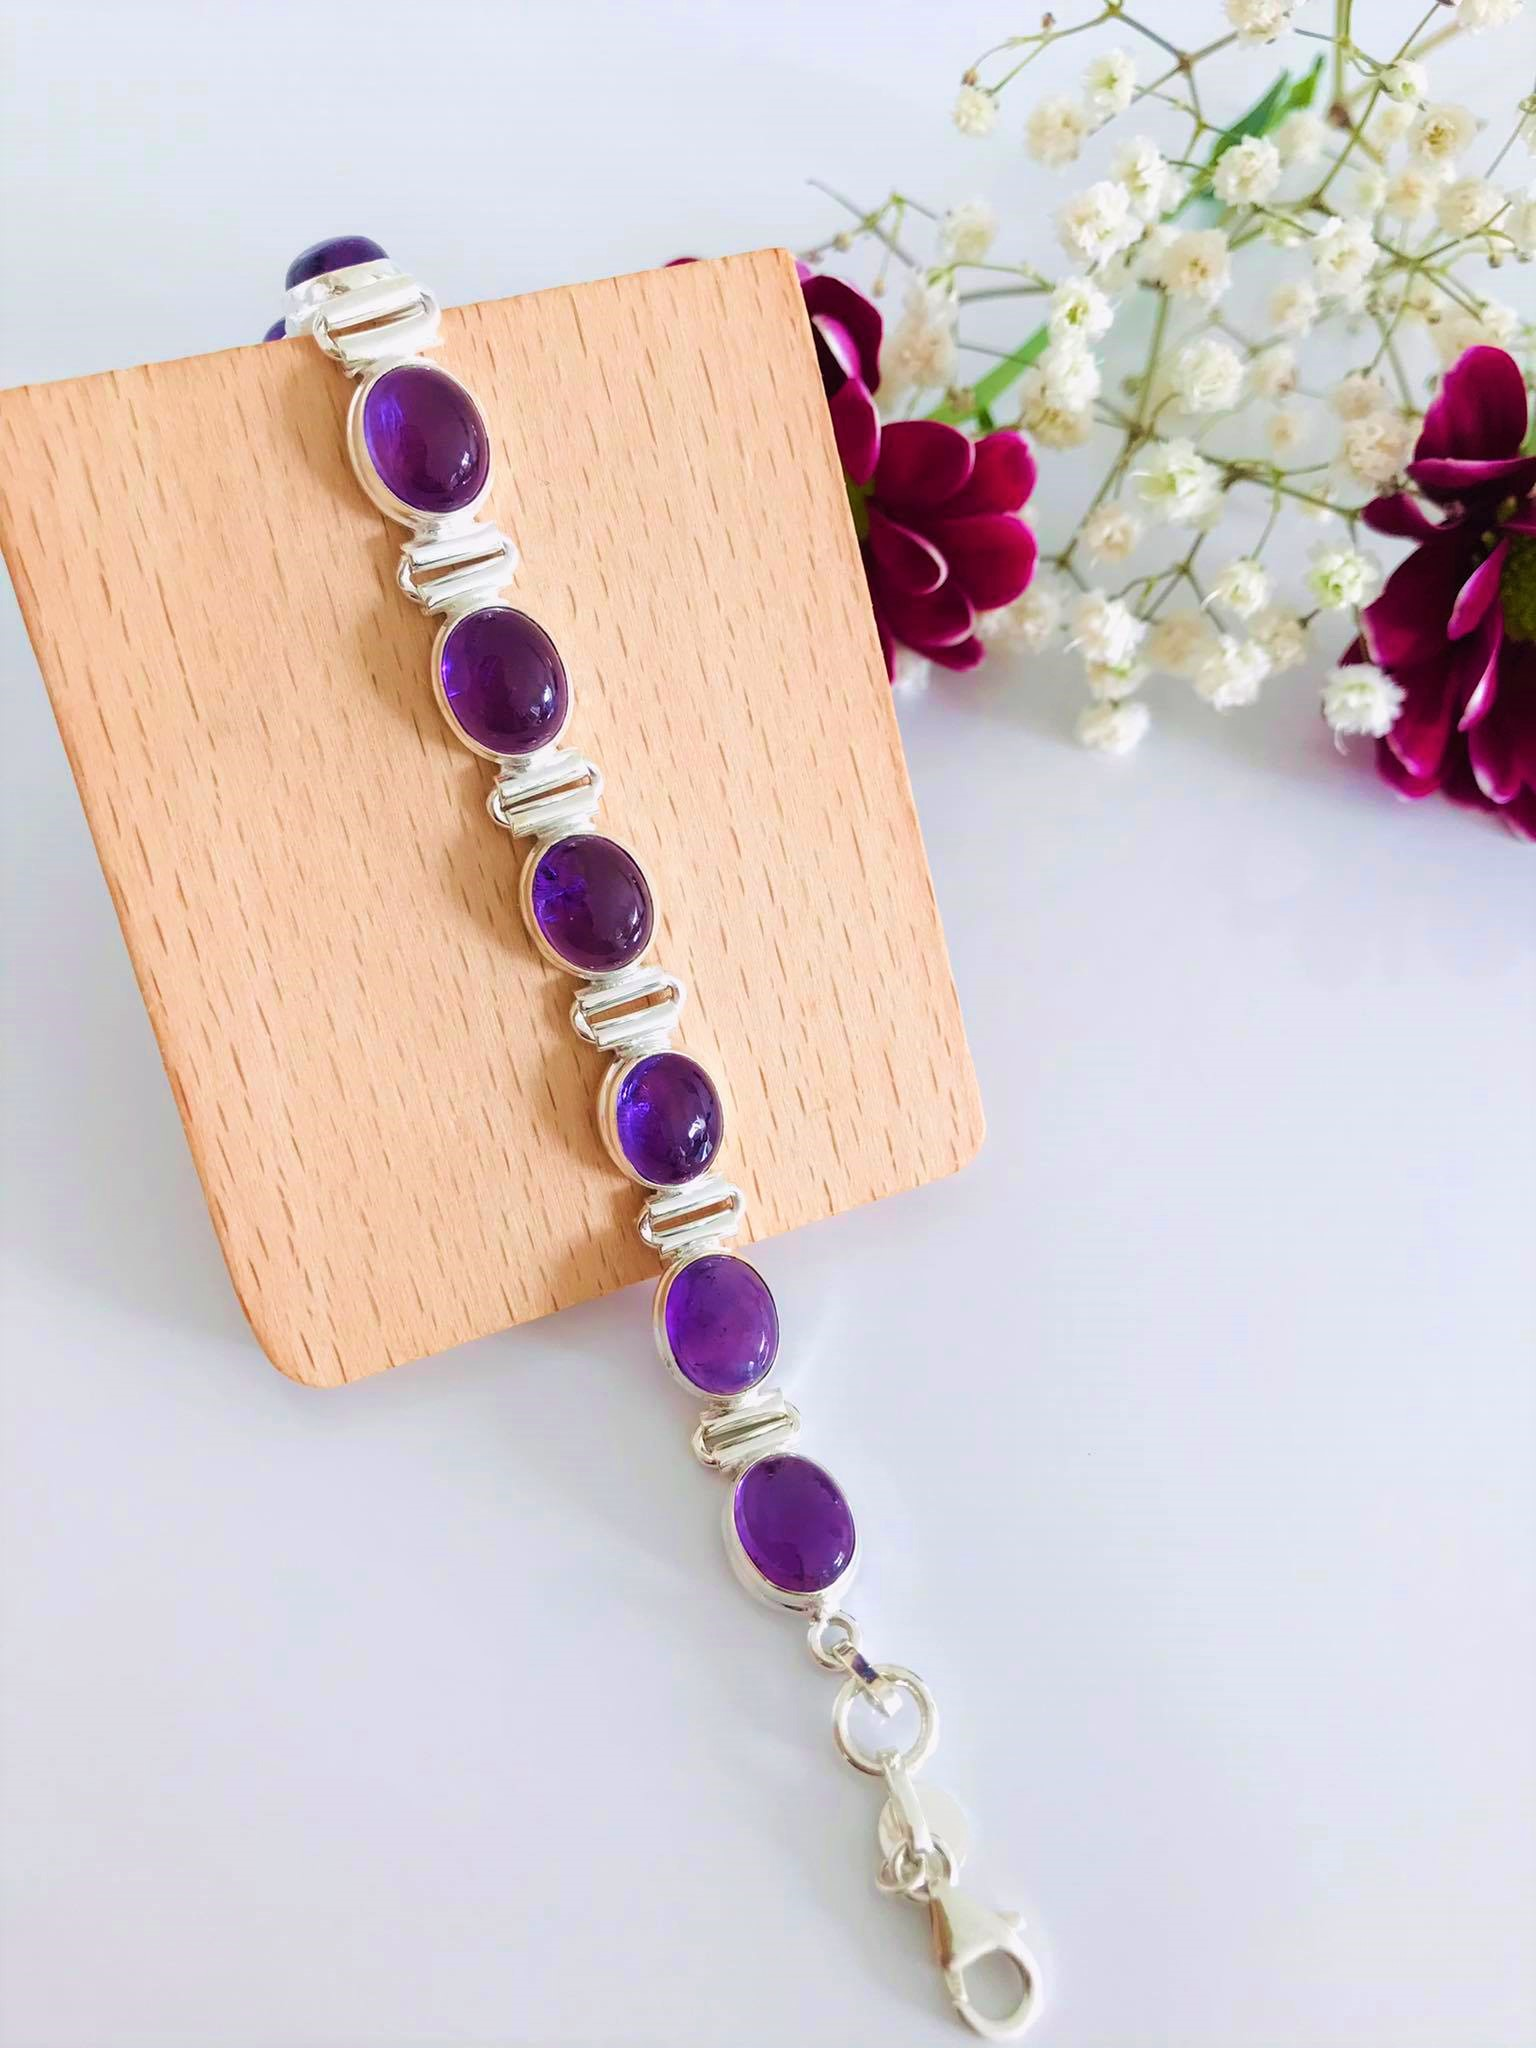 Amethyst set in Silver Bracelet  Image